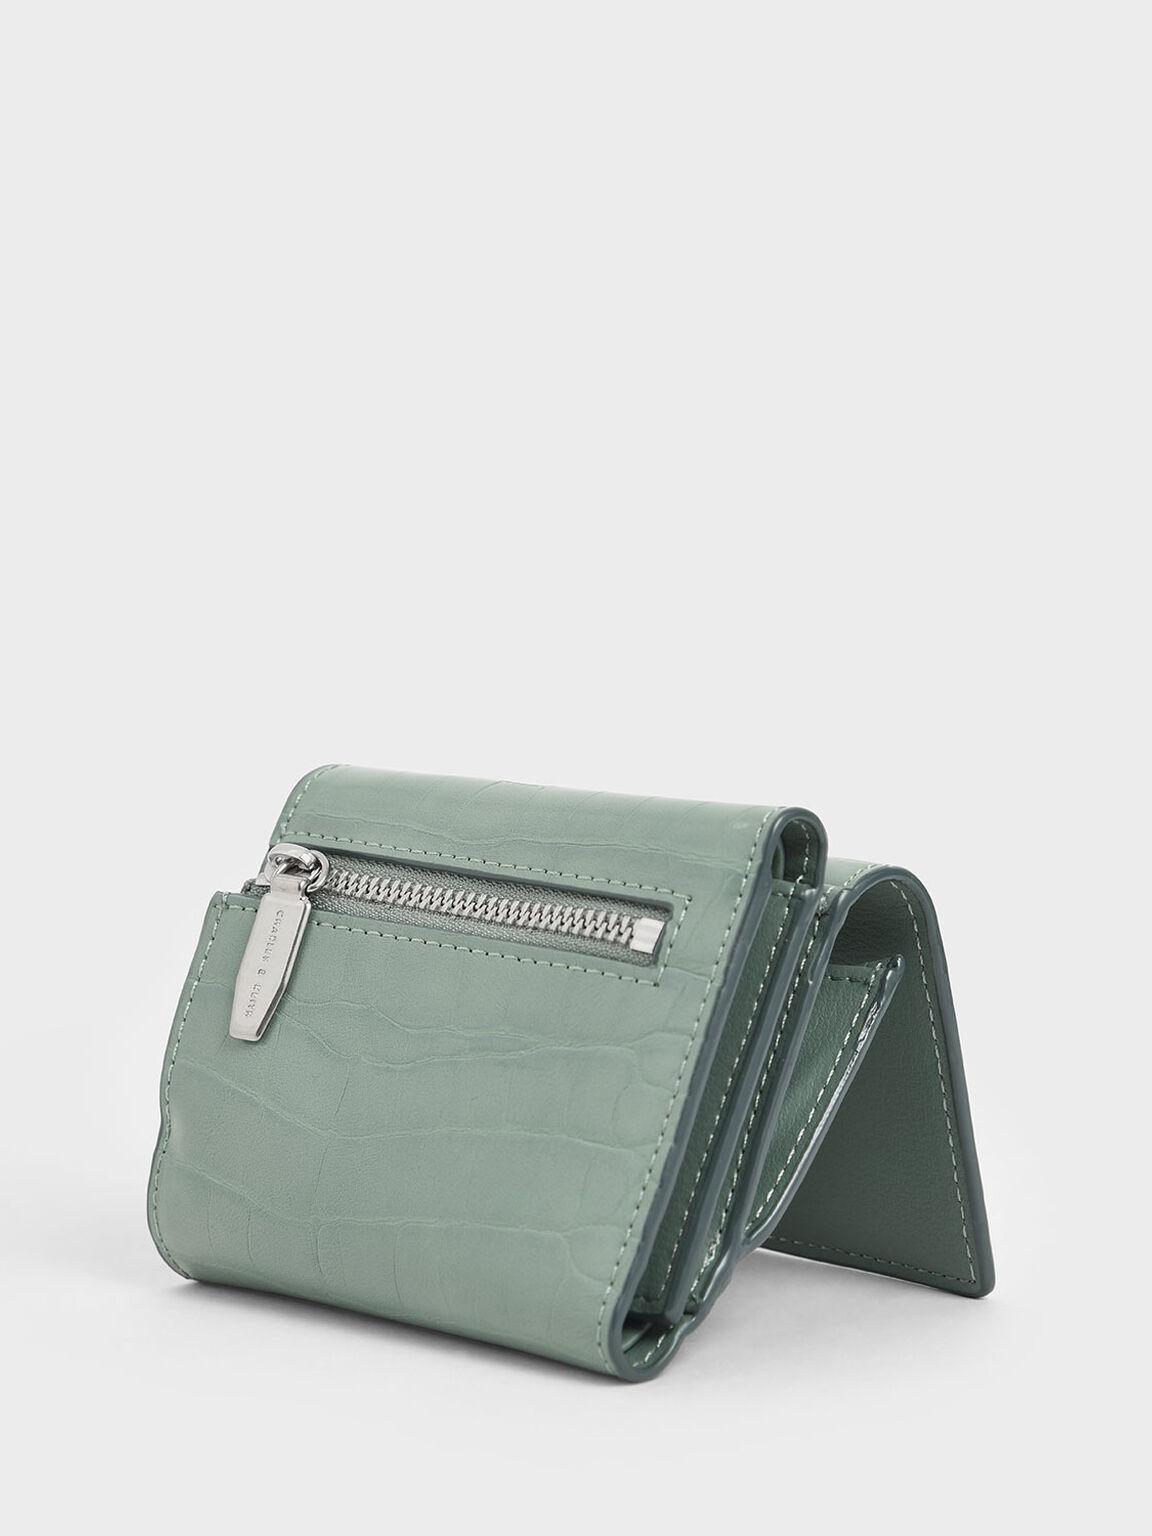 Croc-Effect Short Wallet, Sage Green, hi-res